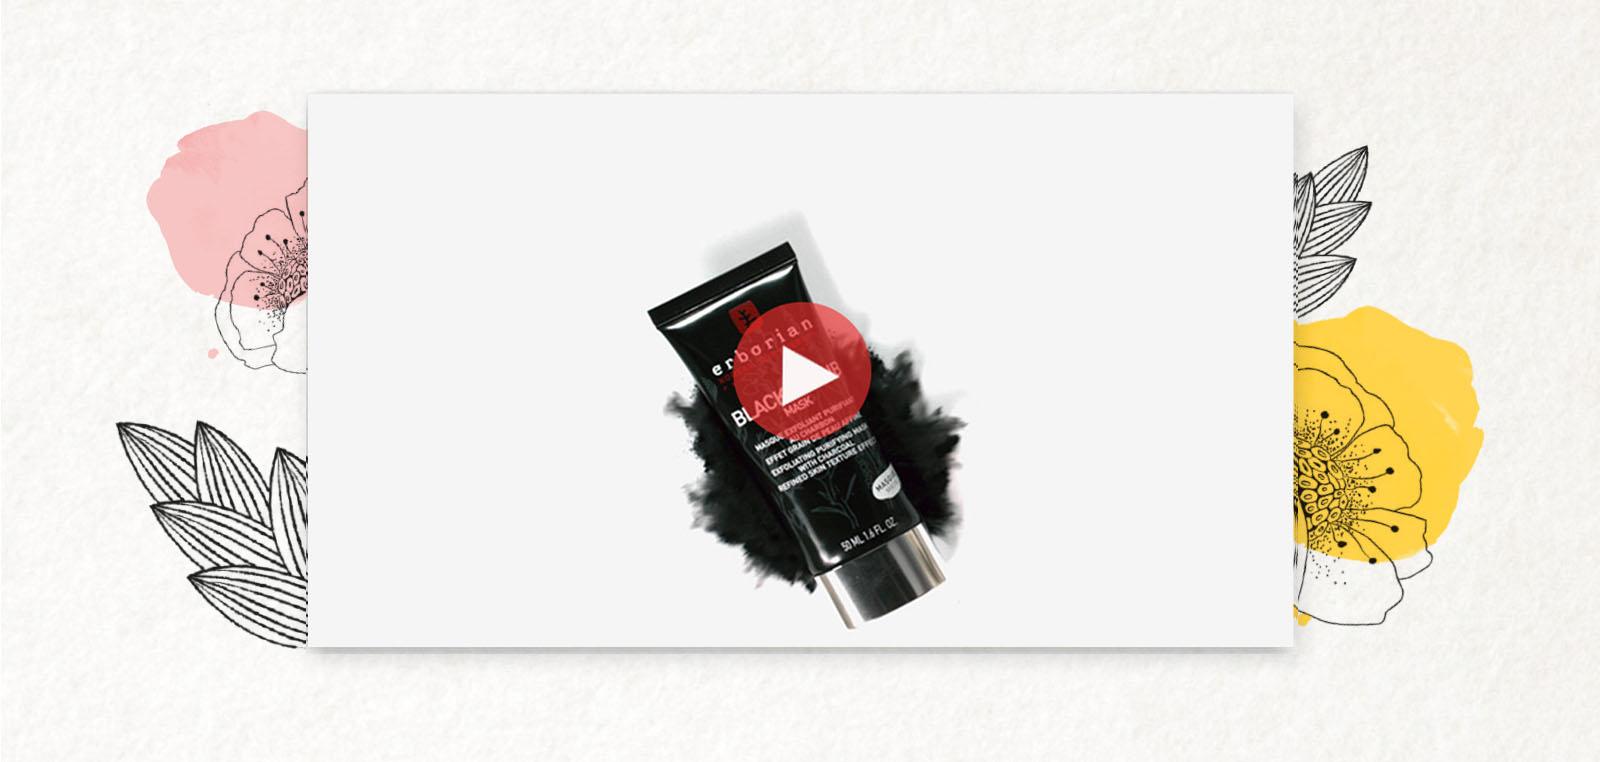 Erborian Video 3 ( CHarcoal )